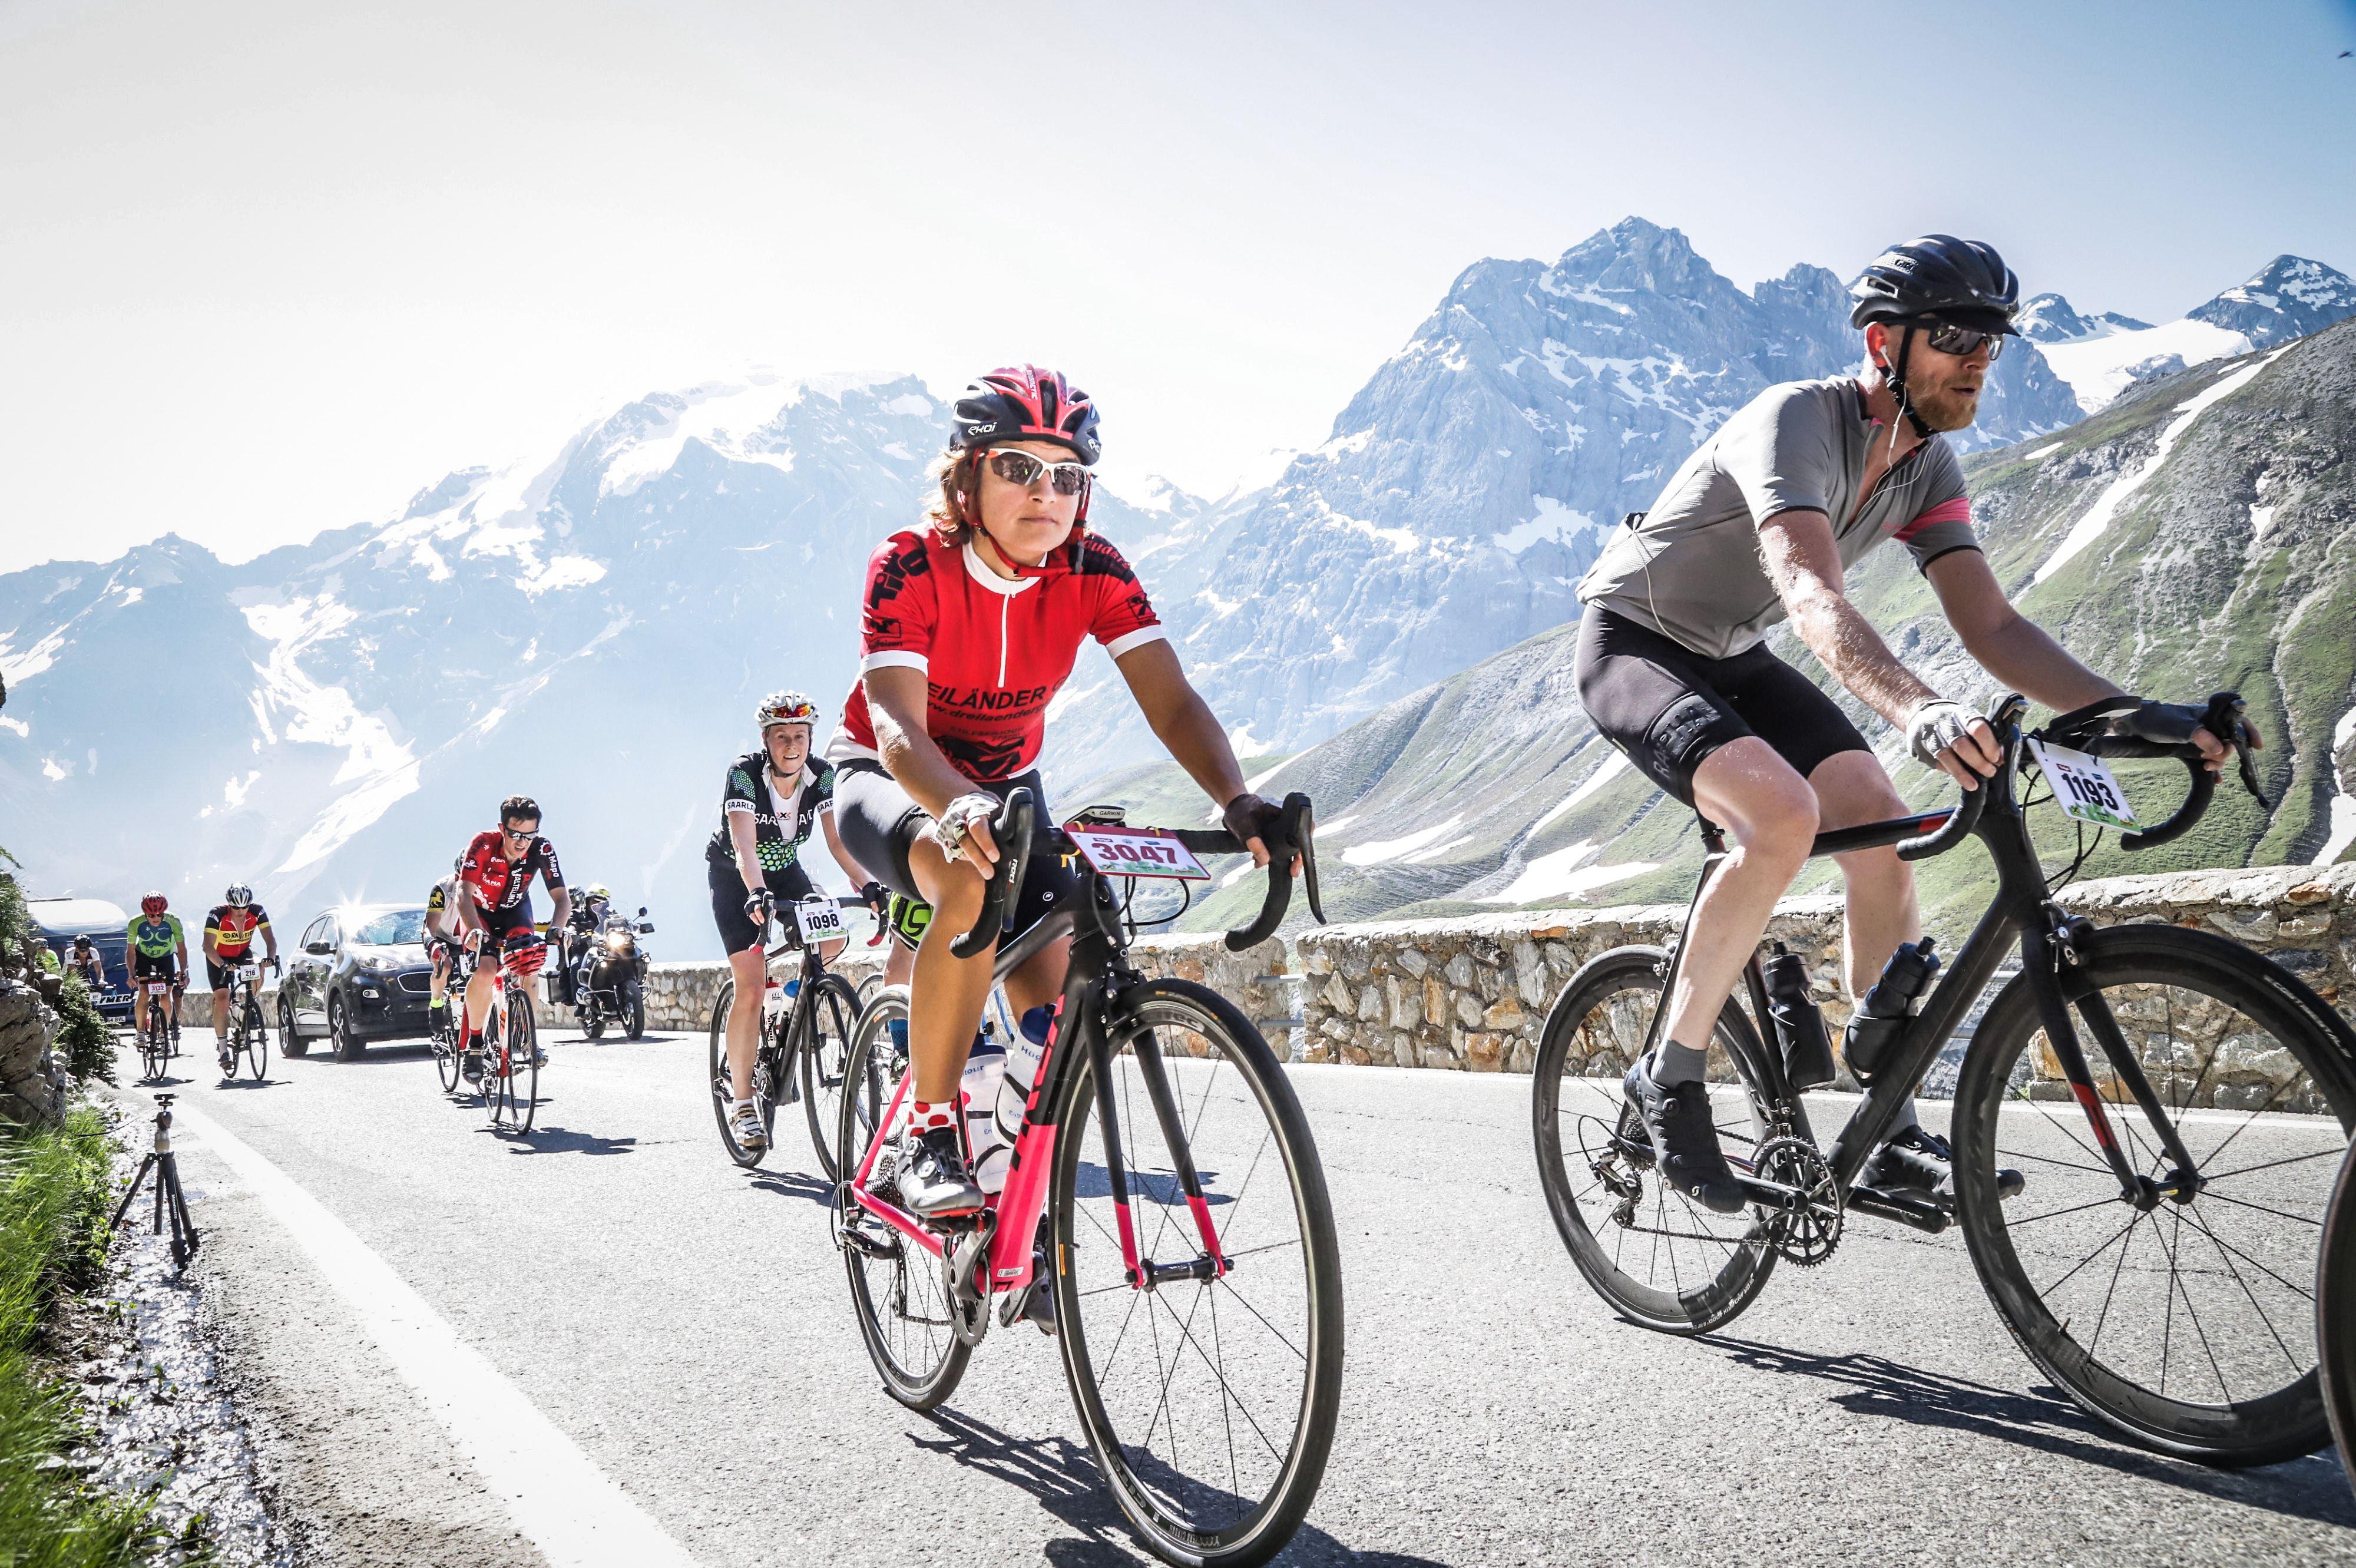 CyclingClubDuesseldorf-Dreiländergiro-Auffahrt zum Passo di Stelvio mit Panorama